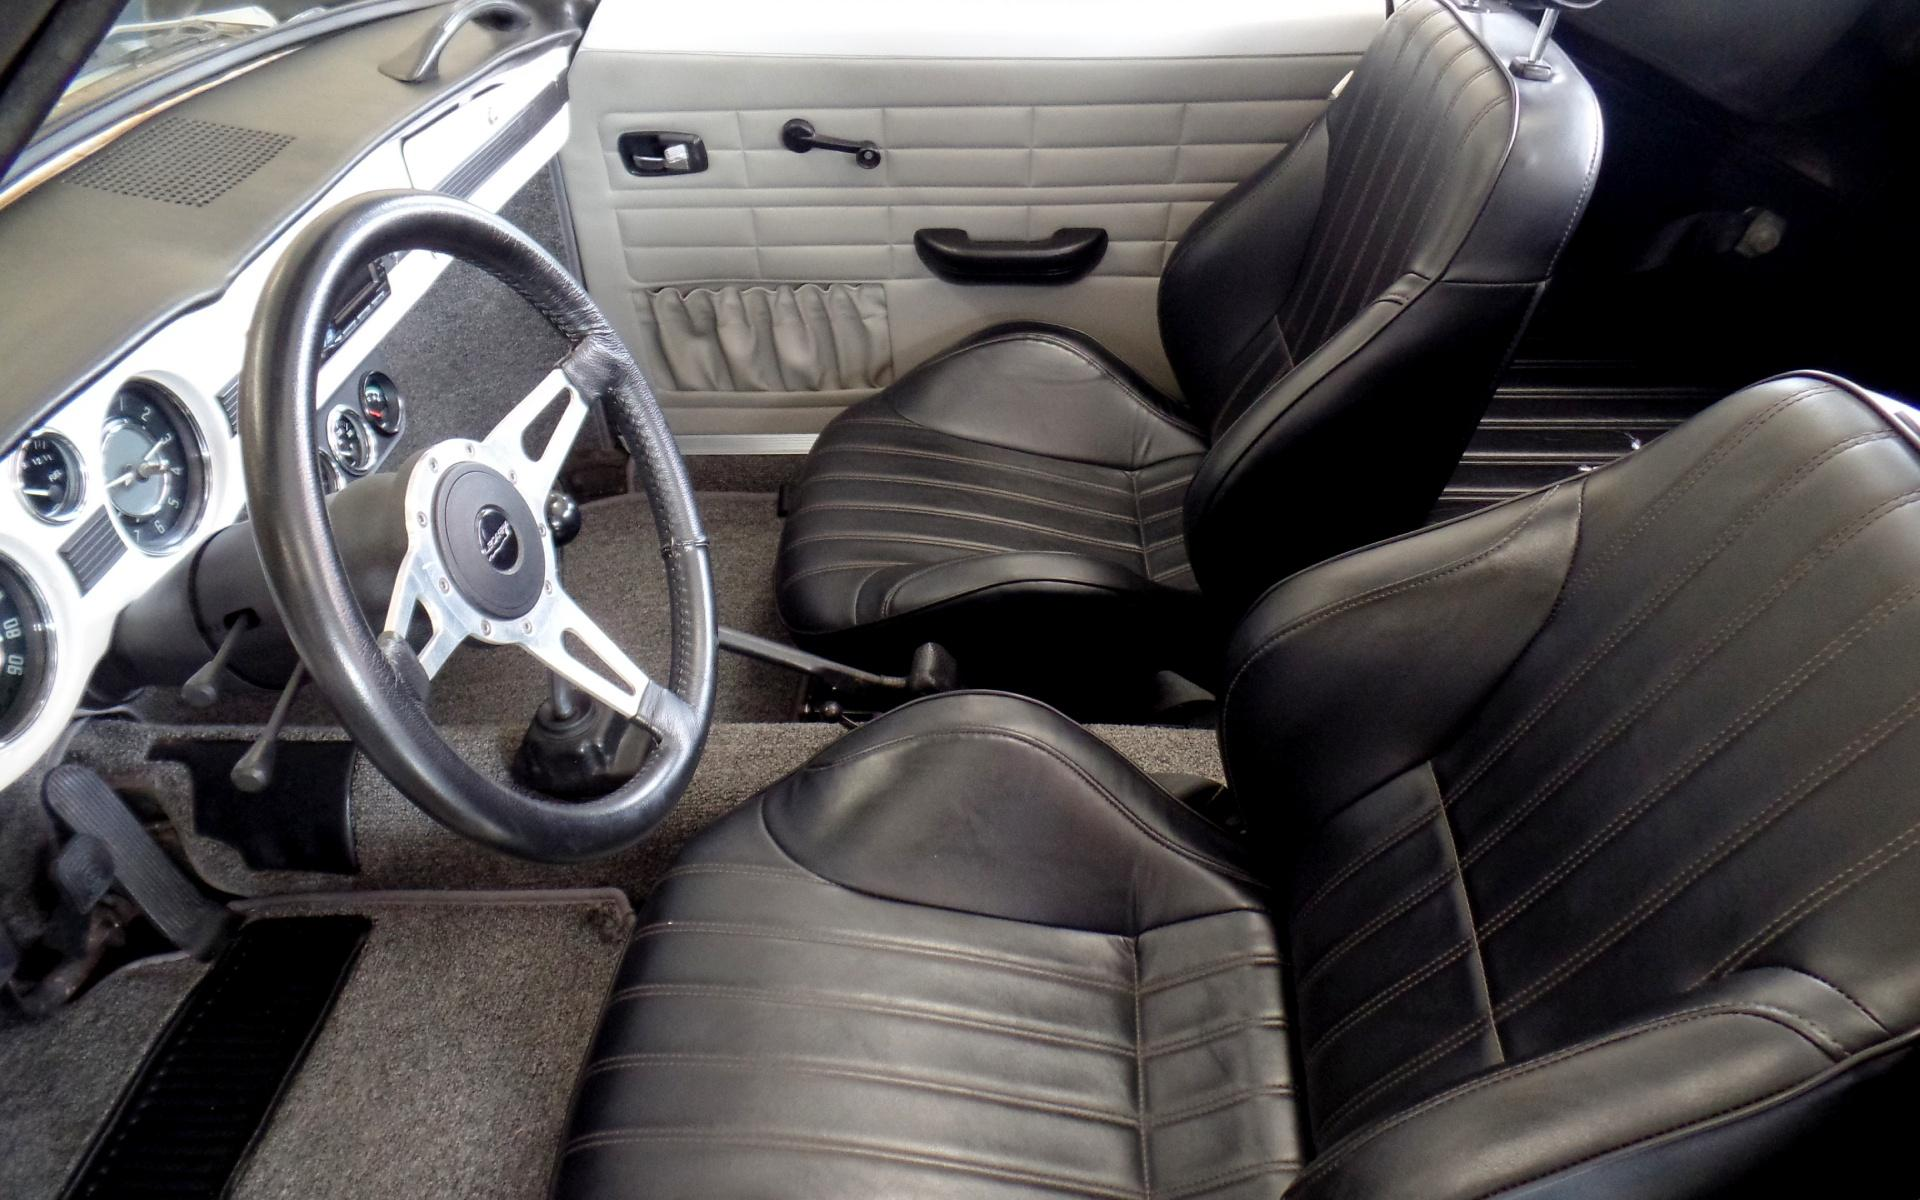 1966 Volkswagen Karmann Ghia Convertible